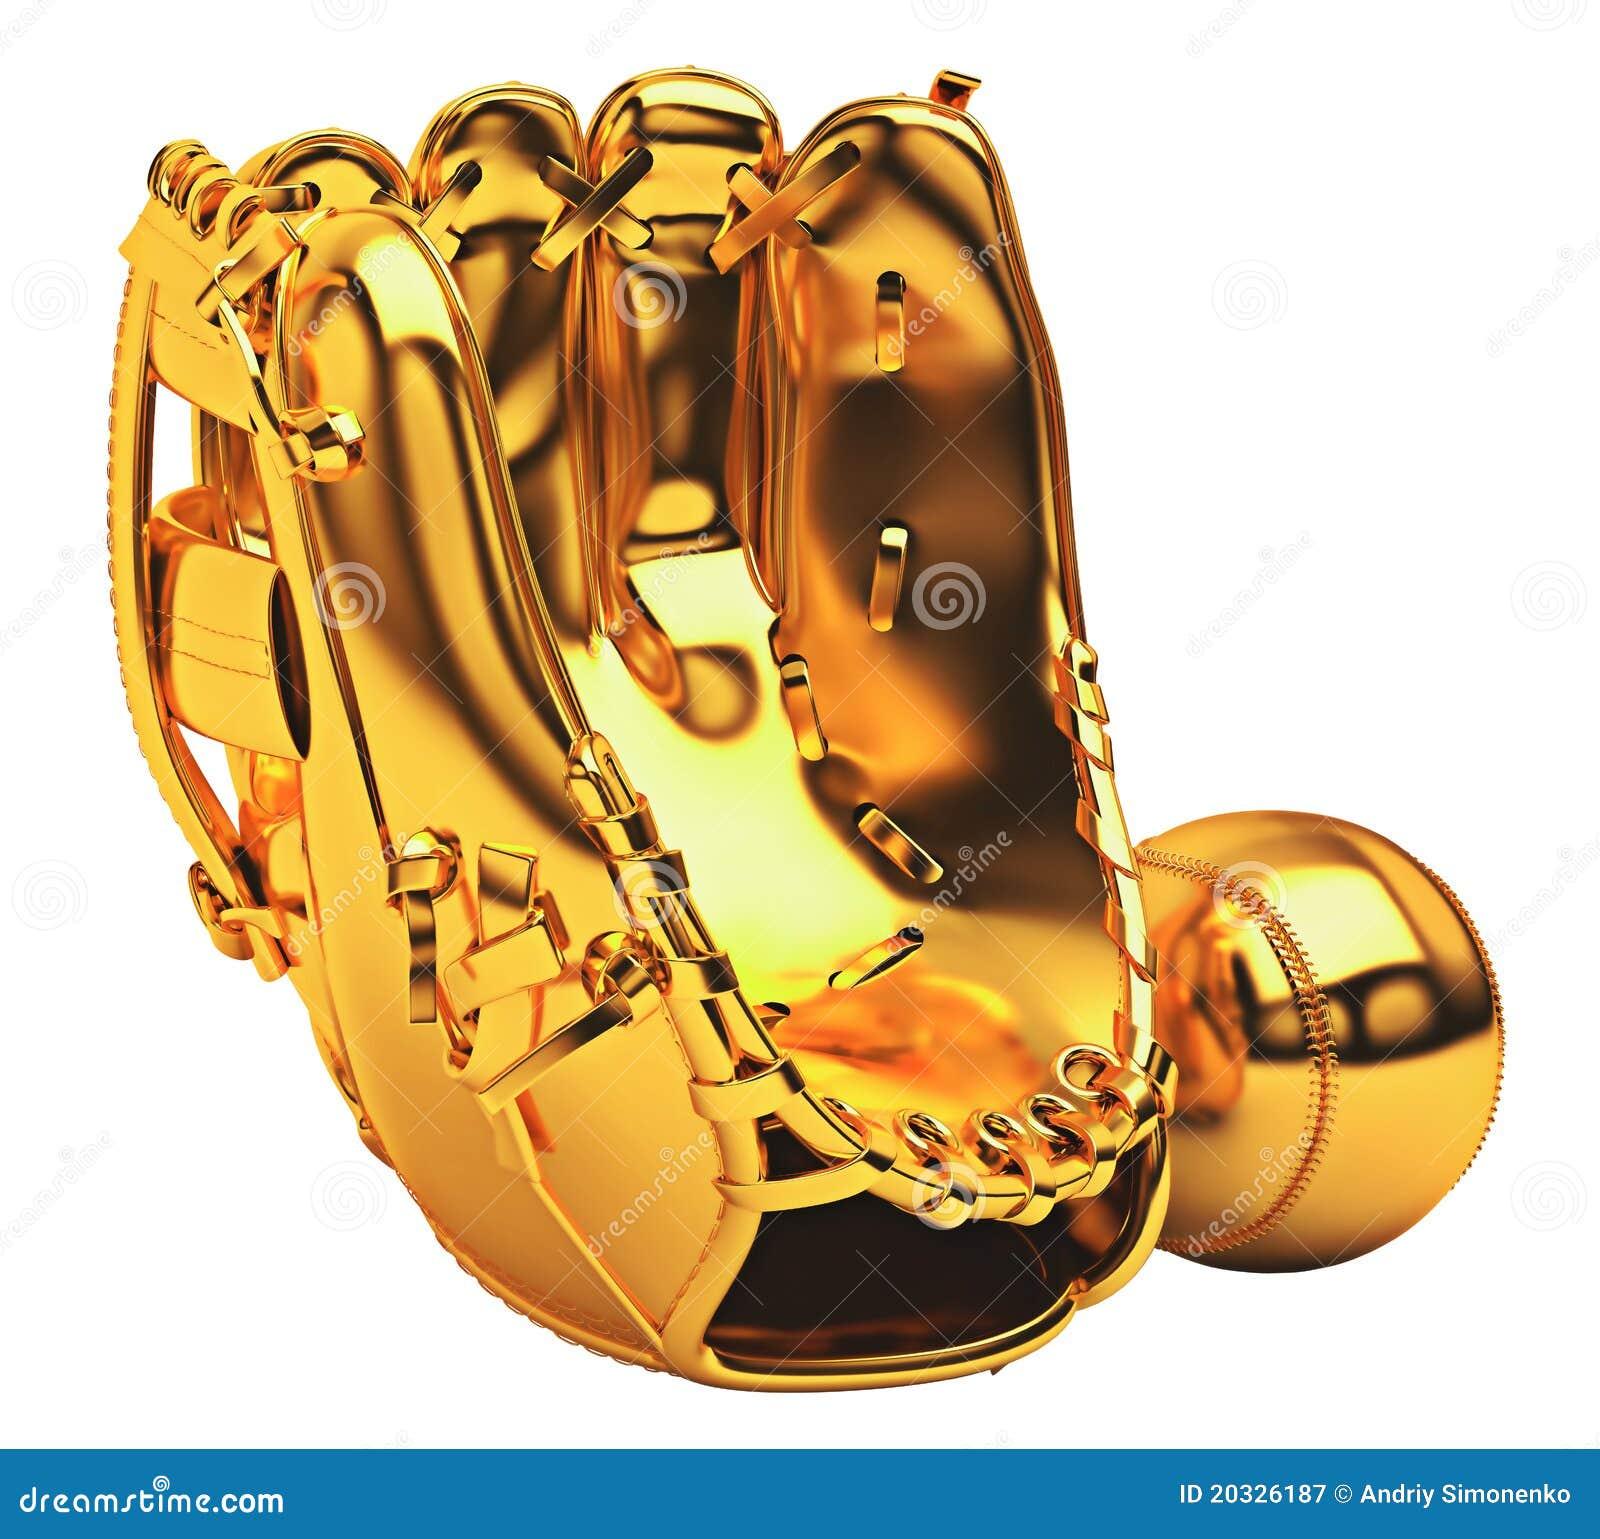 Sports: Golden Baseball Glove Royalty Free Stock ...